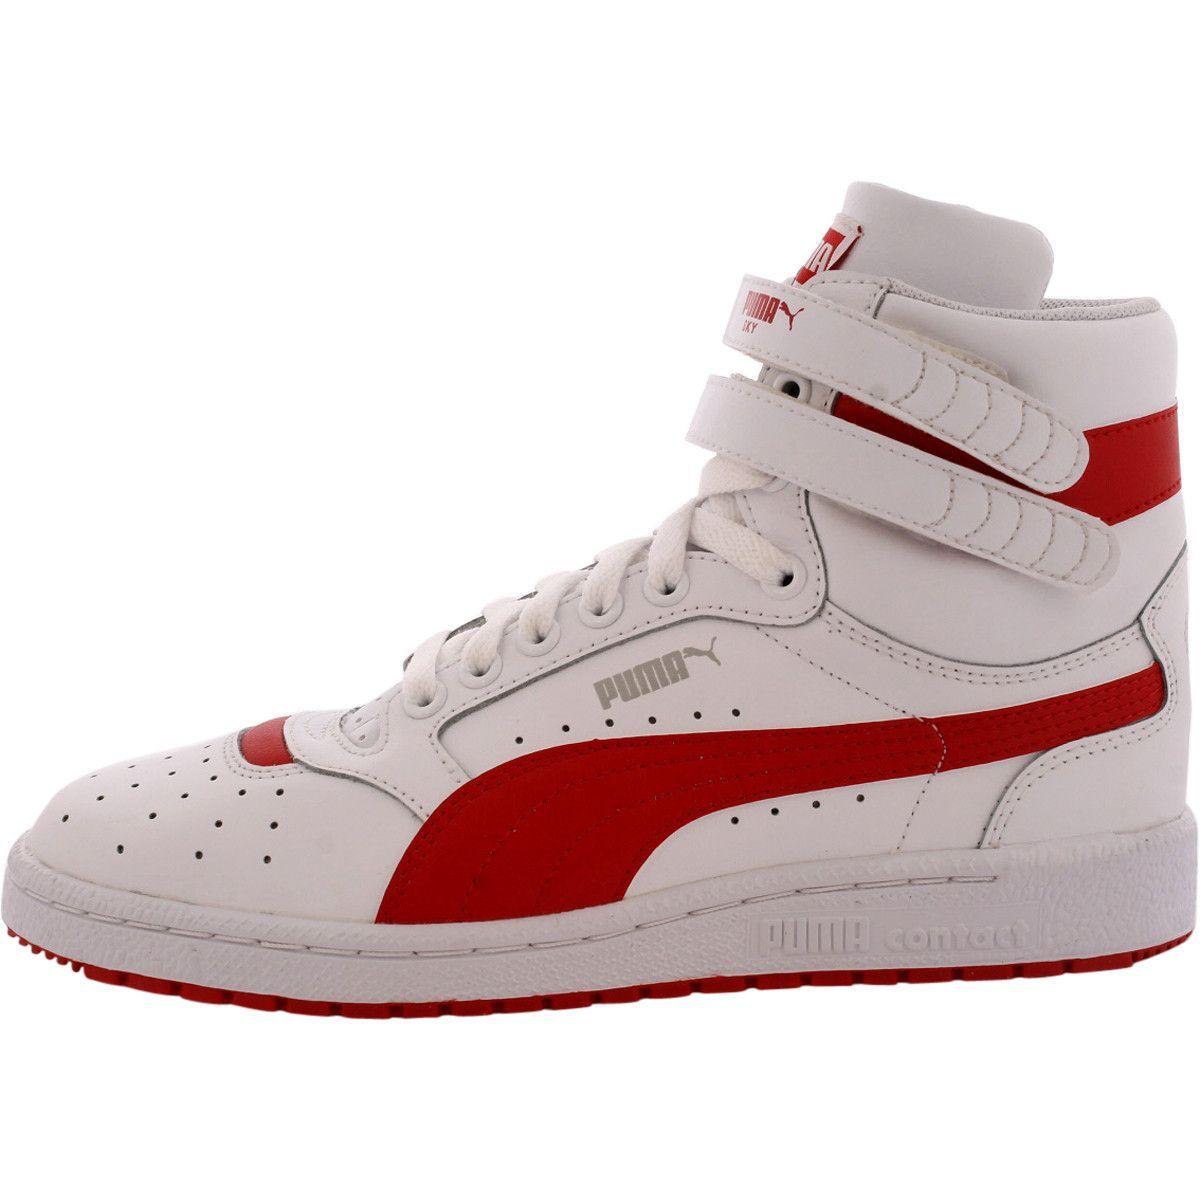 b396b7e34584 Puma - Boys  Sky II Hi Jr Sneakers (Big Kid) - White Red